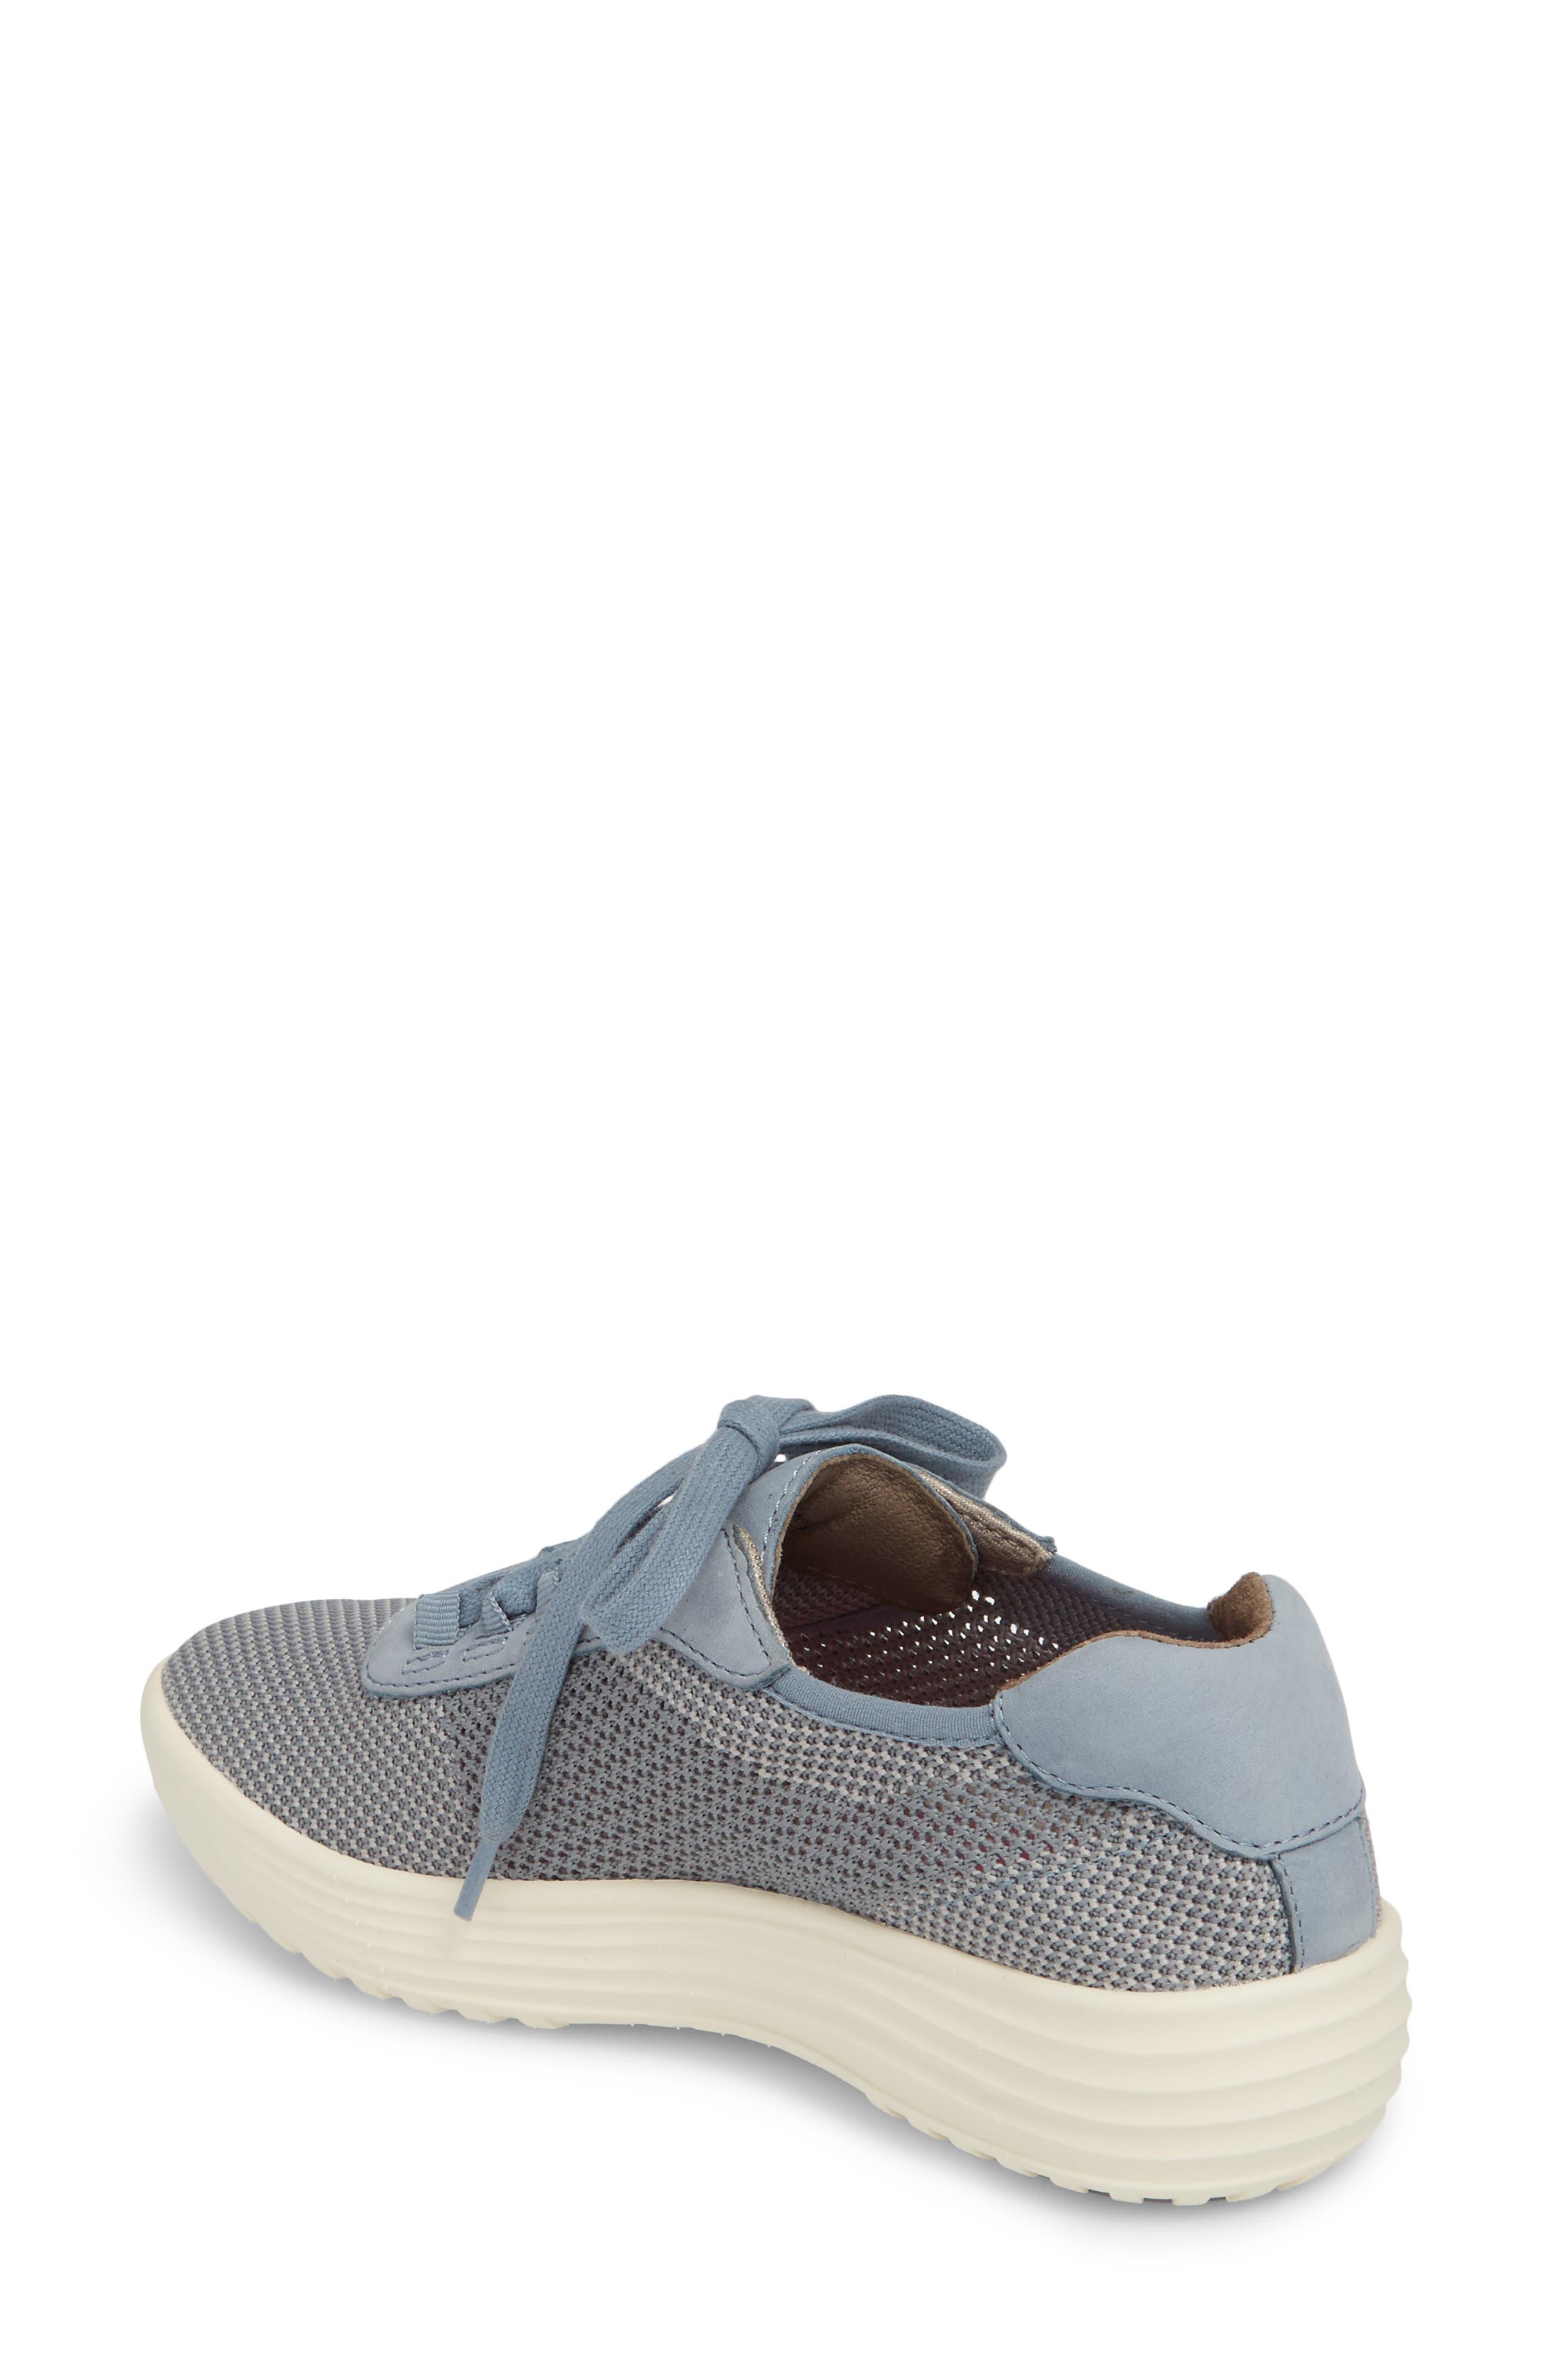 Malibu Sneaker,                             Alternate thumbnail 2, color,                             Chambray Grey Knit Fabric